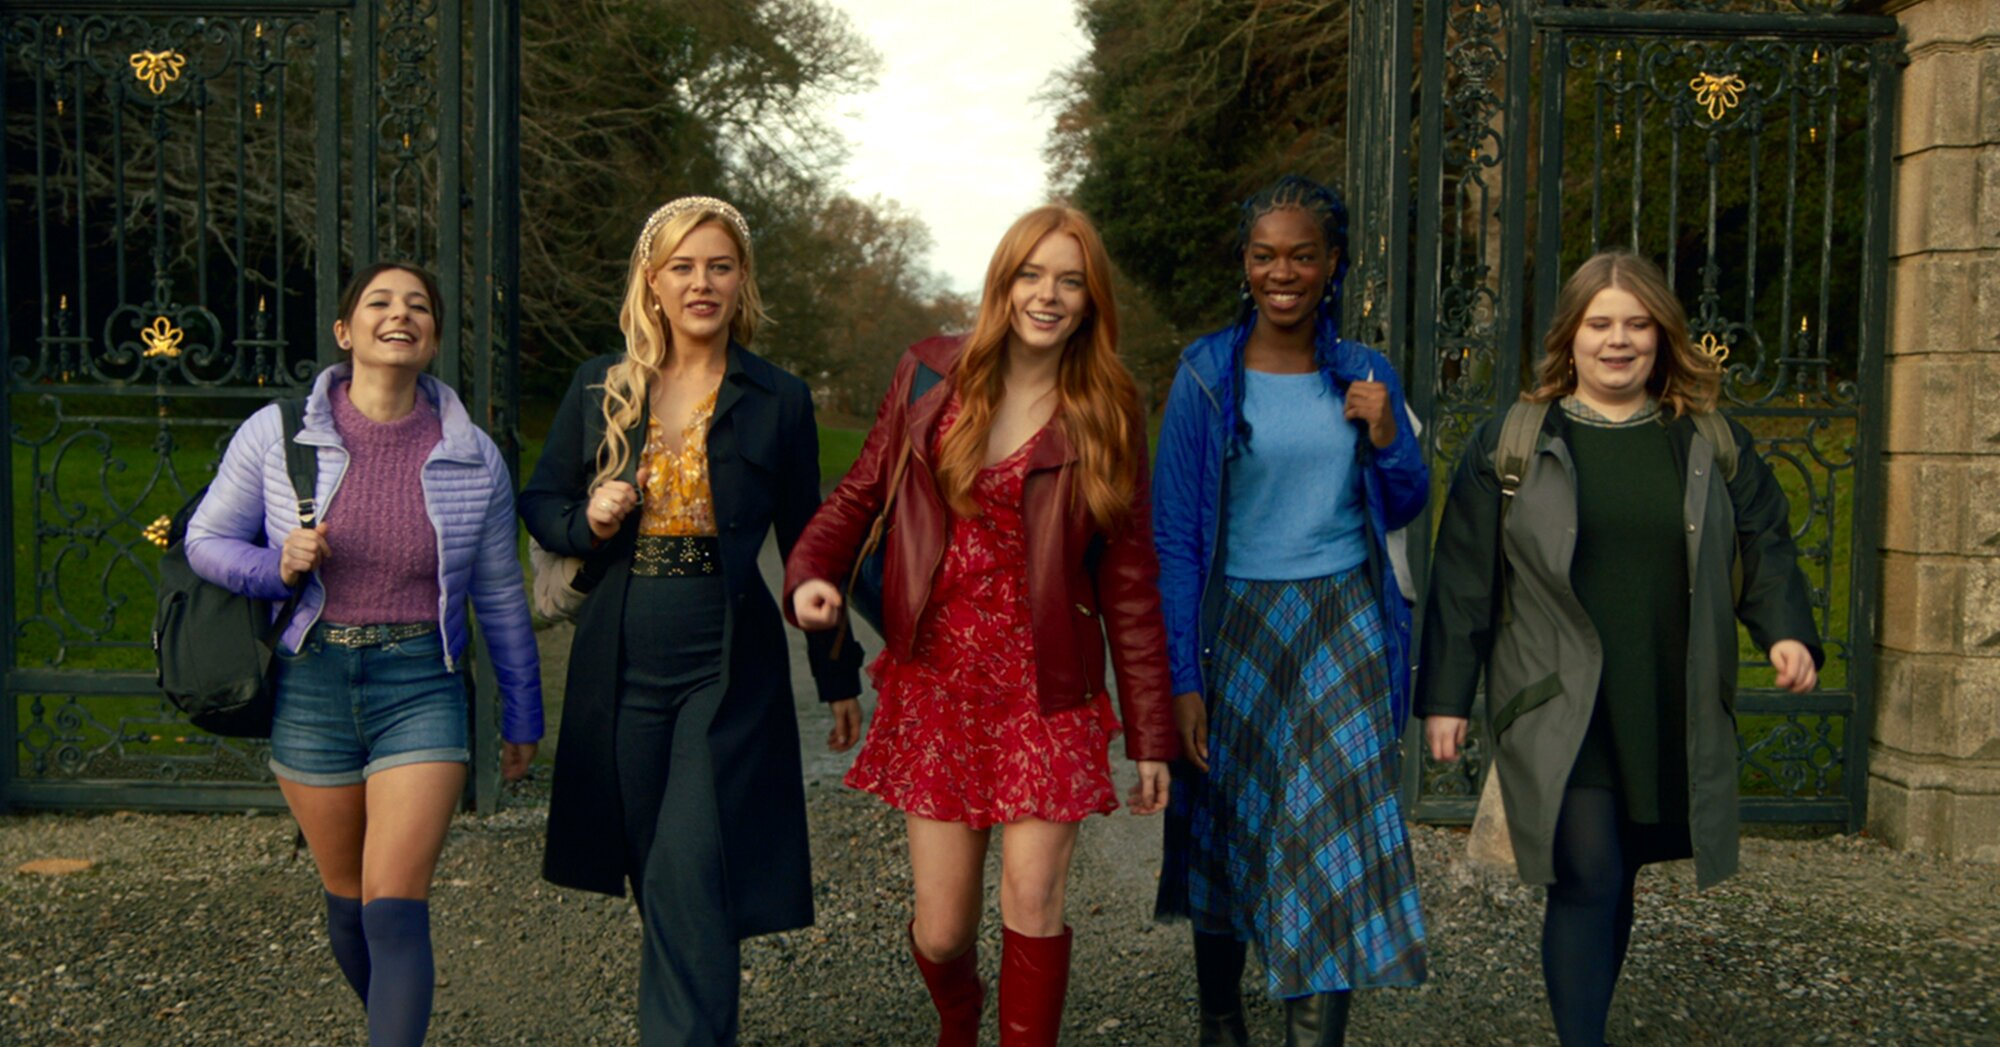 First Fate: The Winx Saga trailer takes us to magic school | EW.com